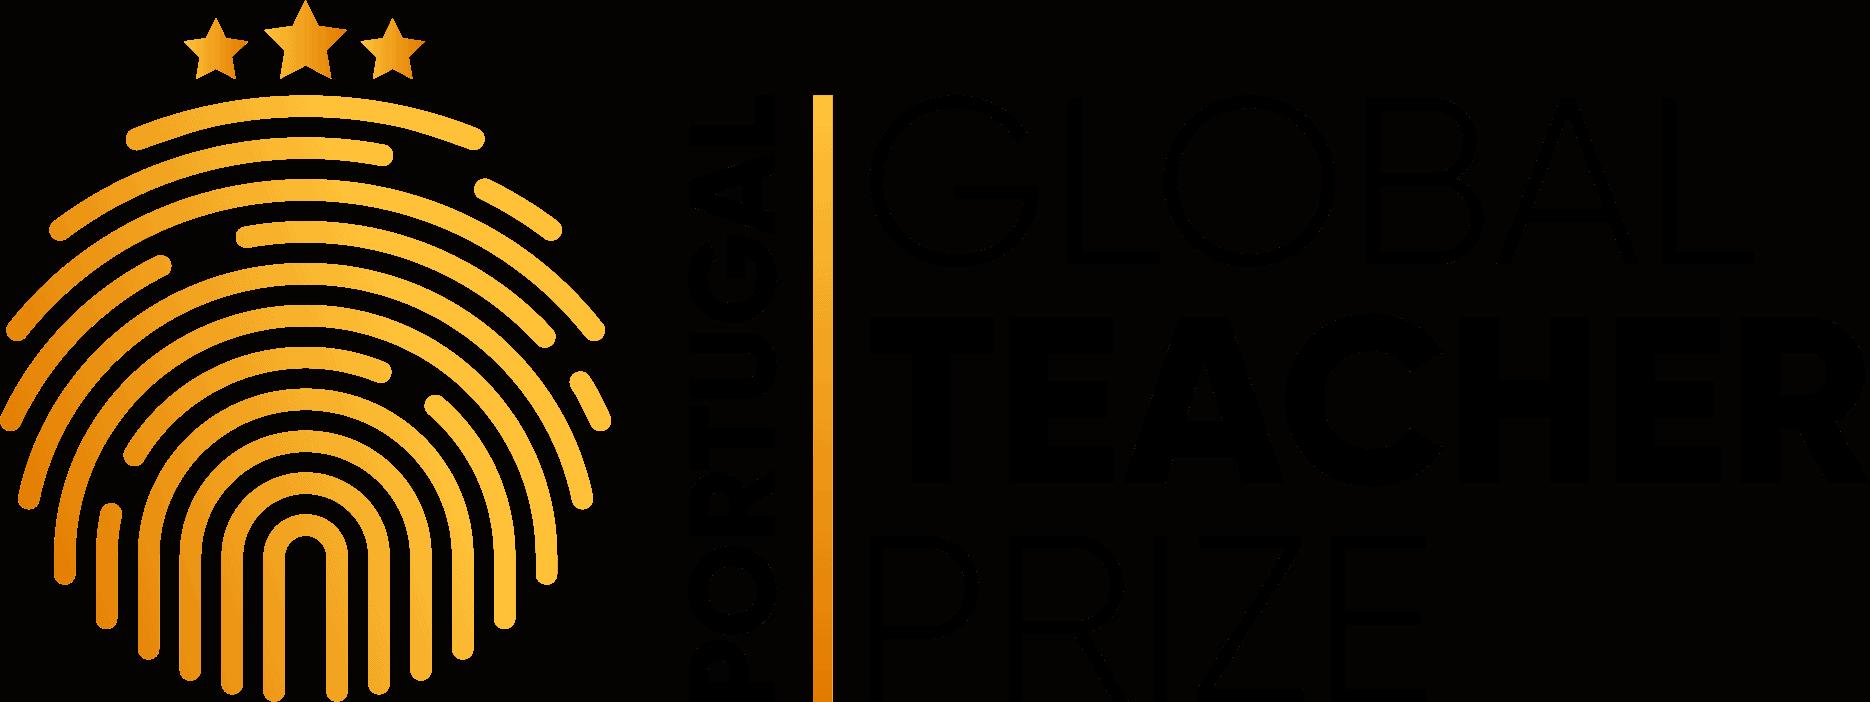 Global Teacher Prize Portugal 2020